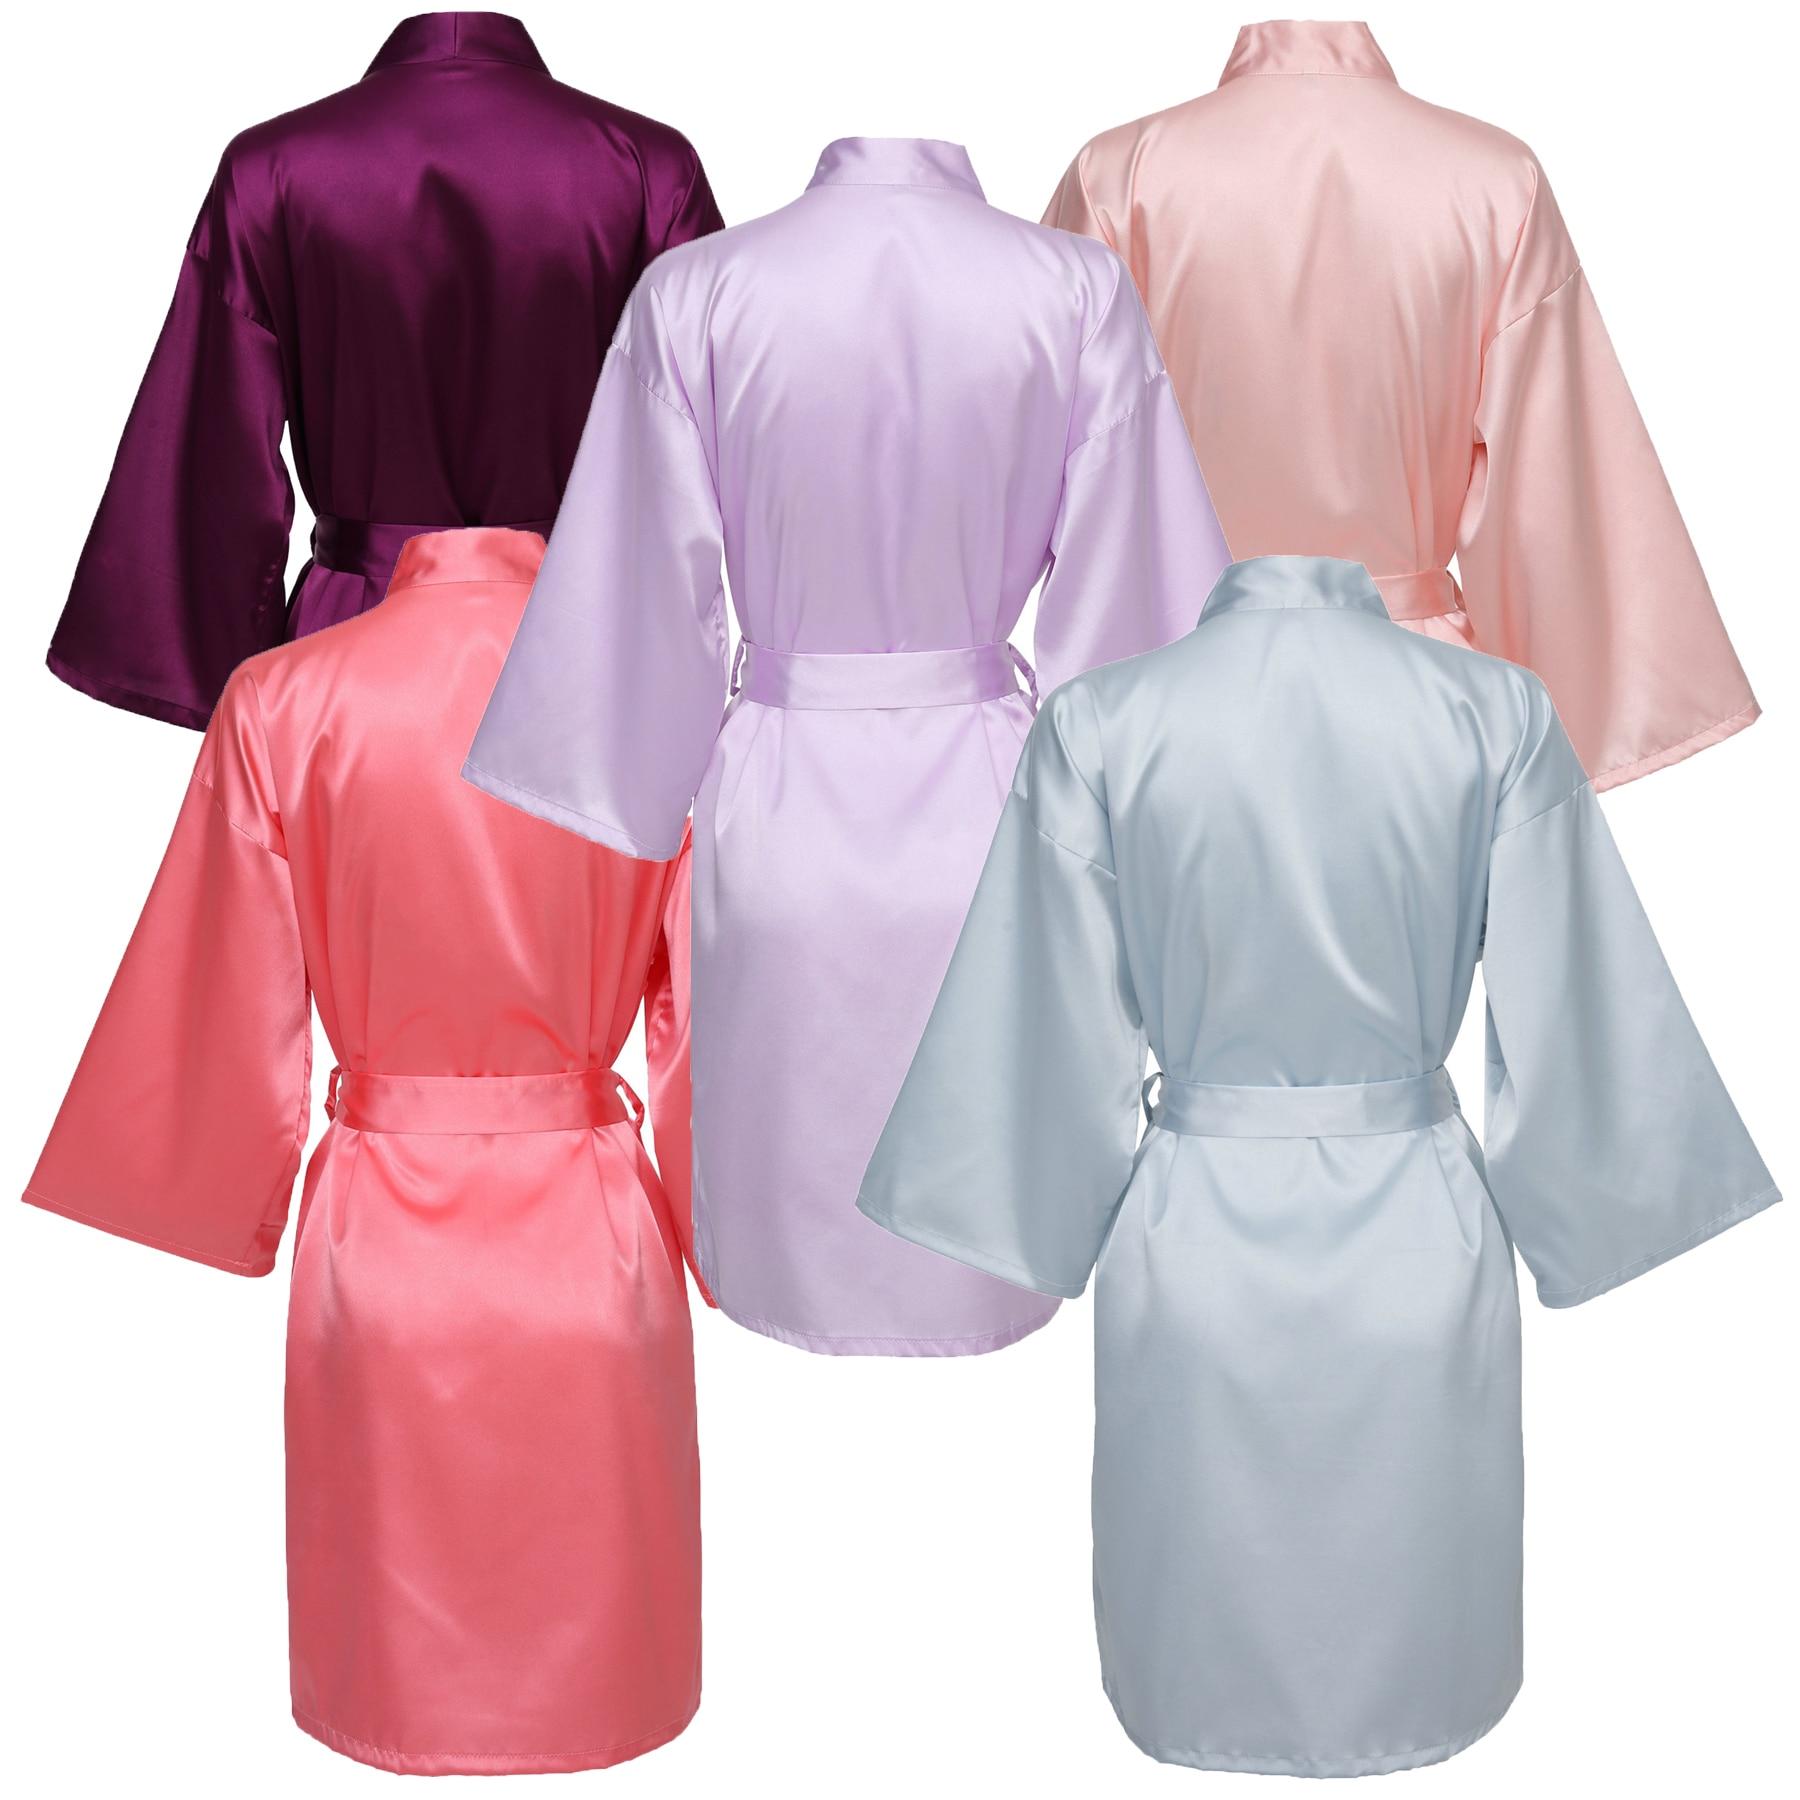 YUXINBRIDAL Colors Golden Font Gown Robes Satin Silk Bride Robe Wedding Bridesmaid Dressing White